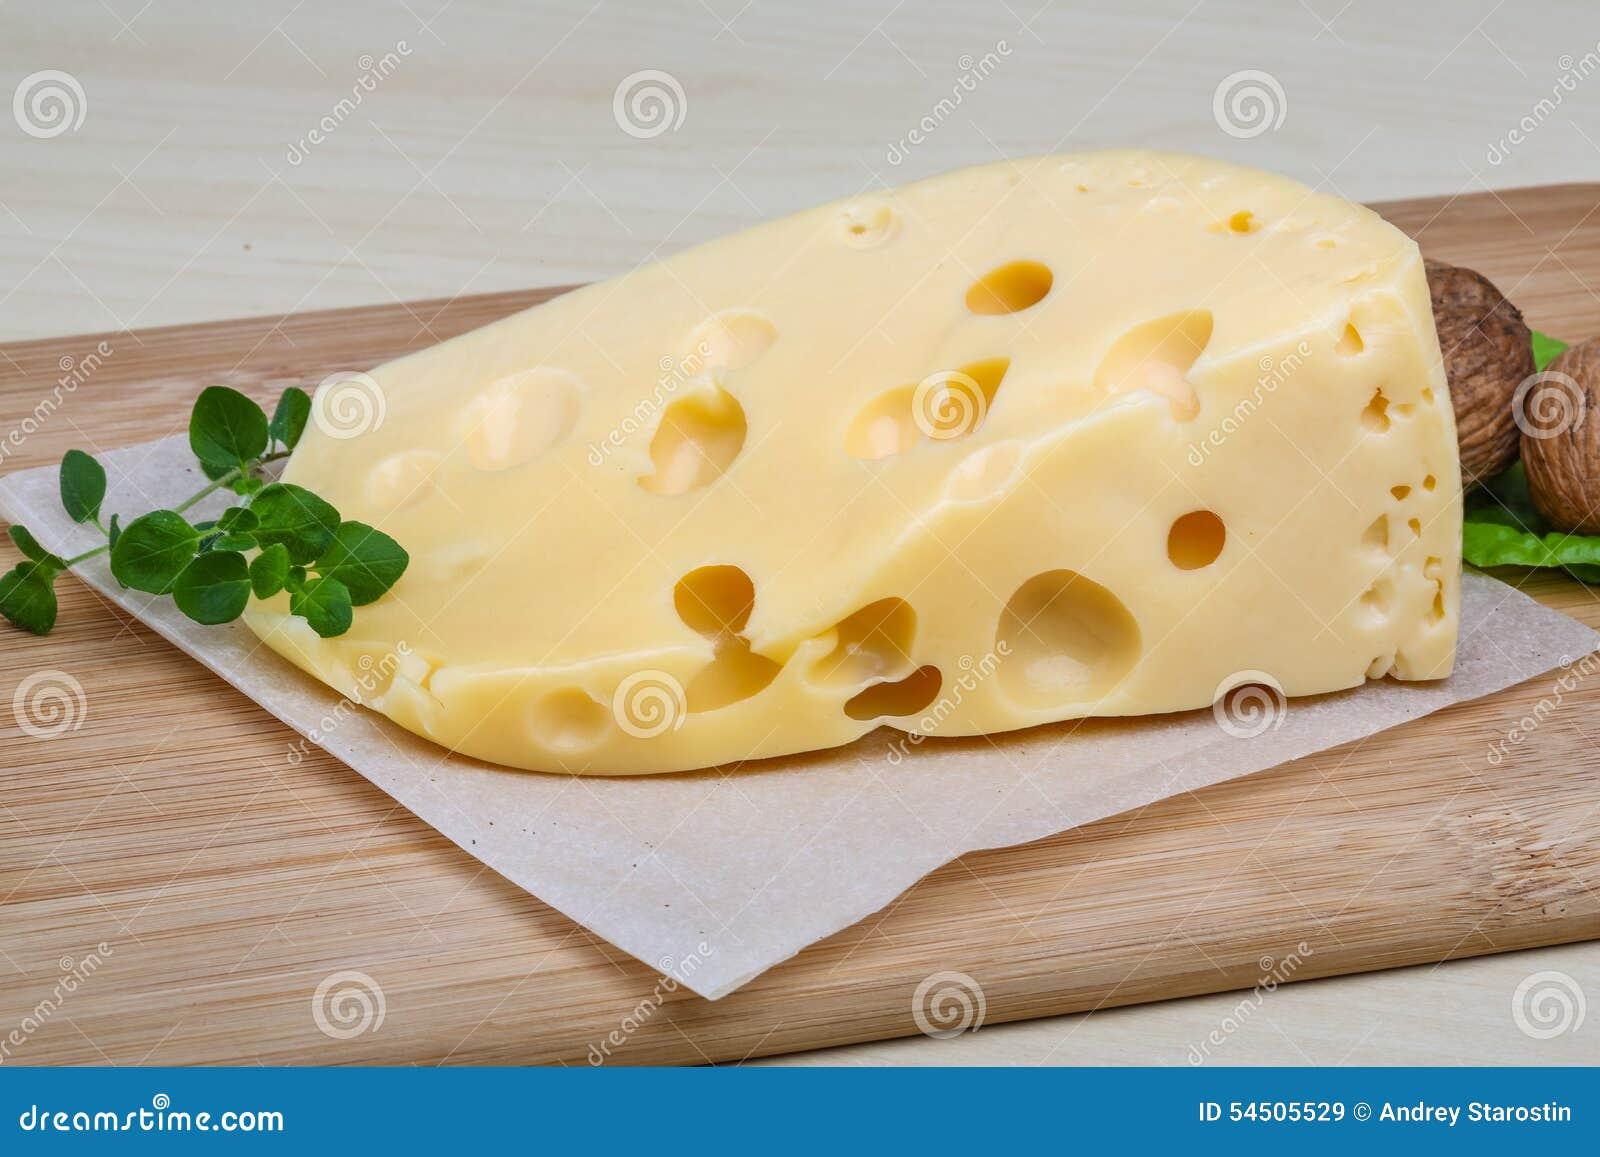 Fromage jaune